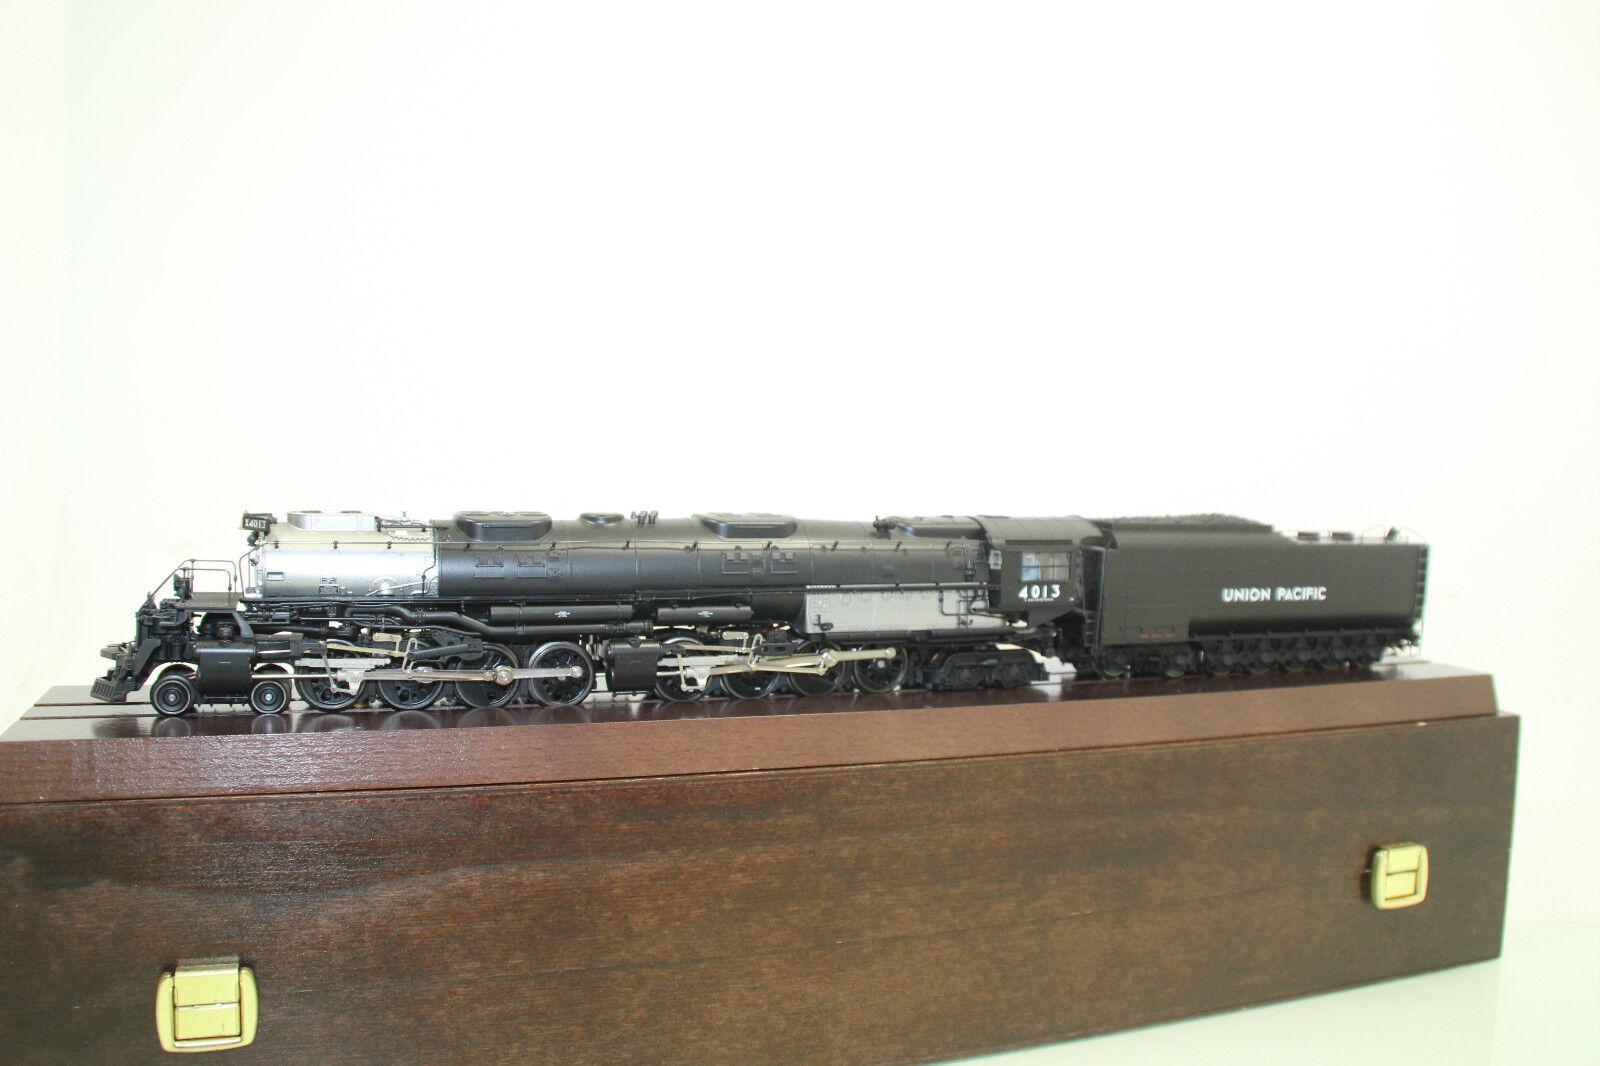 h0 34990 US locomotiva Class 4000  Big Boy  Delta-digitale in scatola originale  nl9329